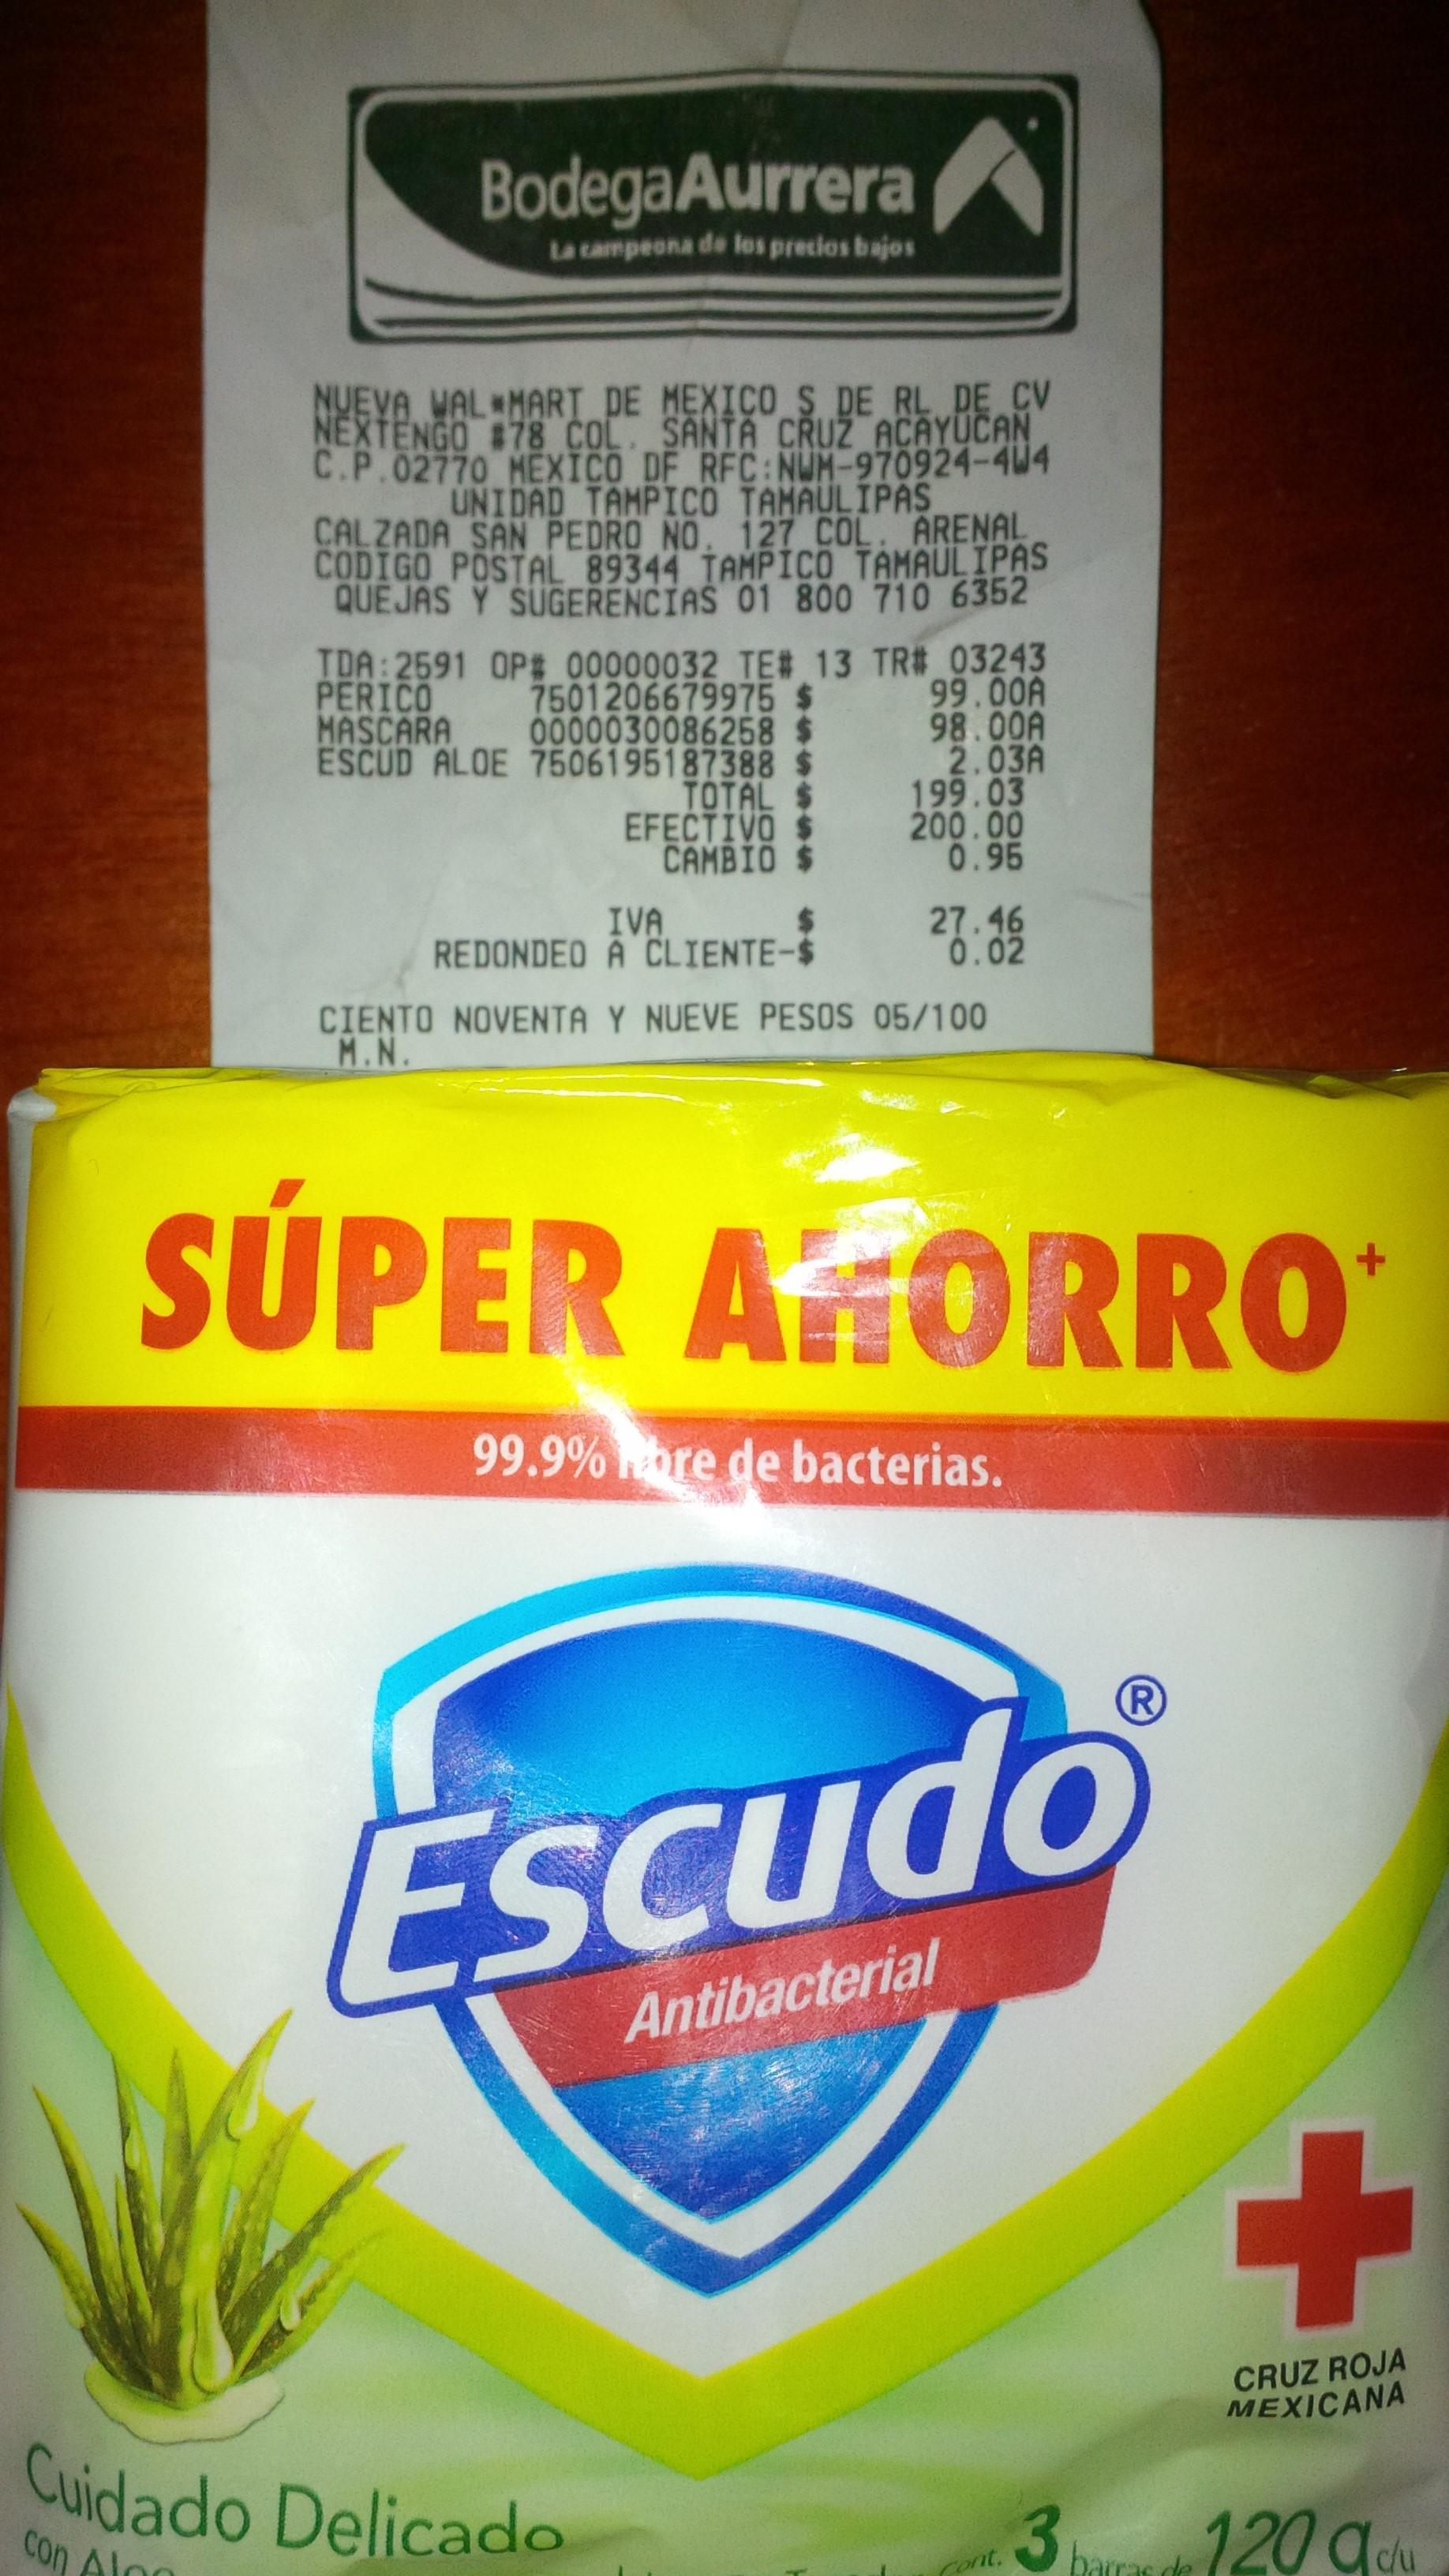 Bodega Aurrera: Paquete Escudo 3 Piezas $2.03